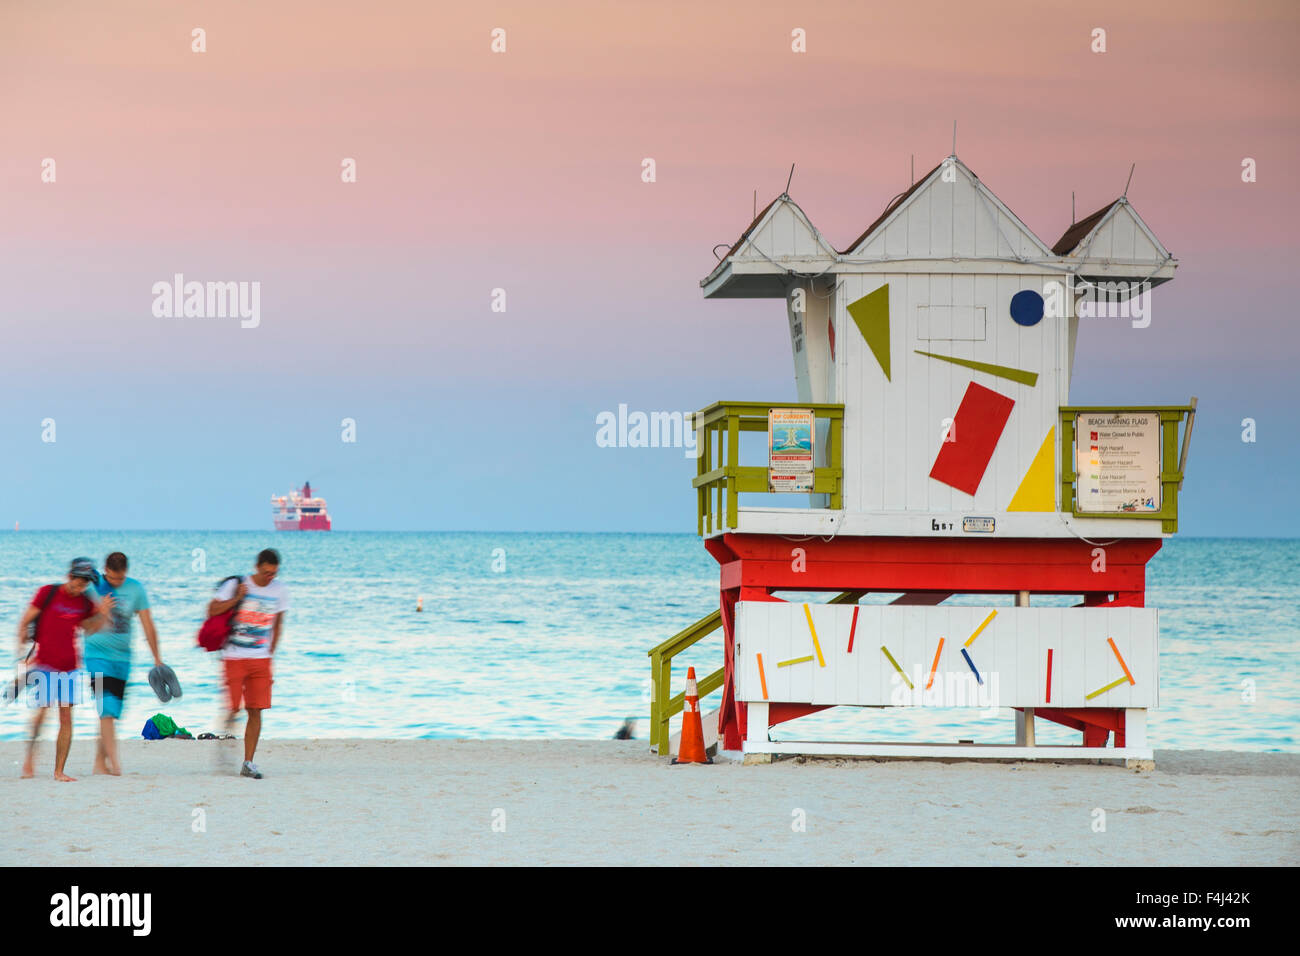 Life guard beach hut, South Beach, Miami Beach, Florida, United States of America, North America - Stock Image